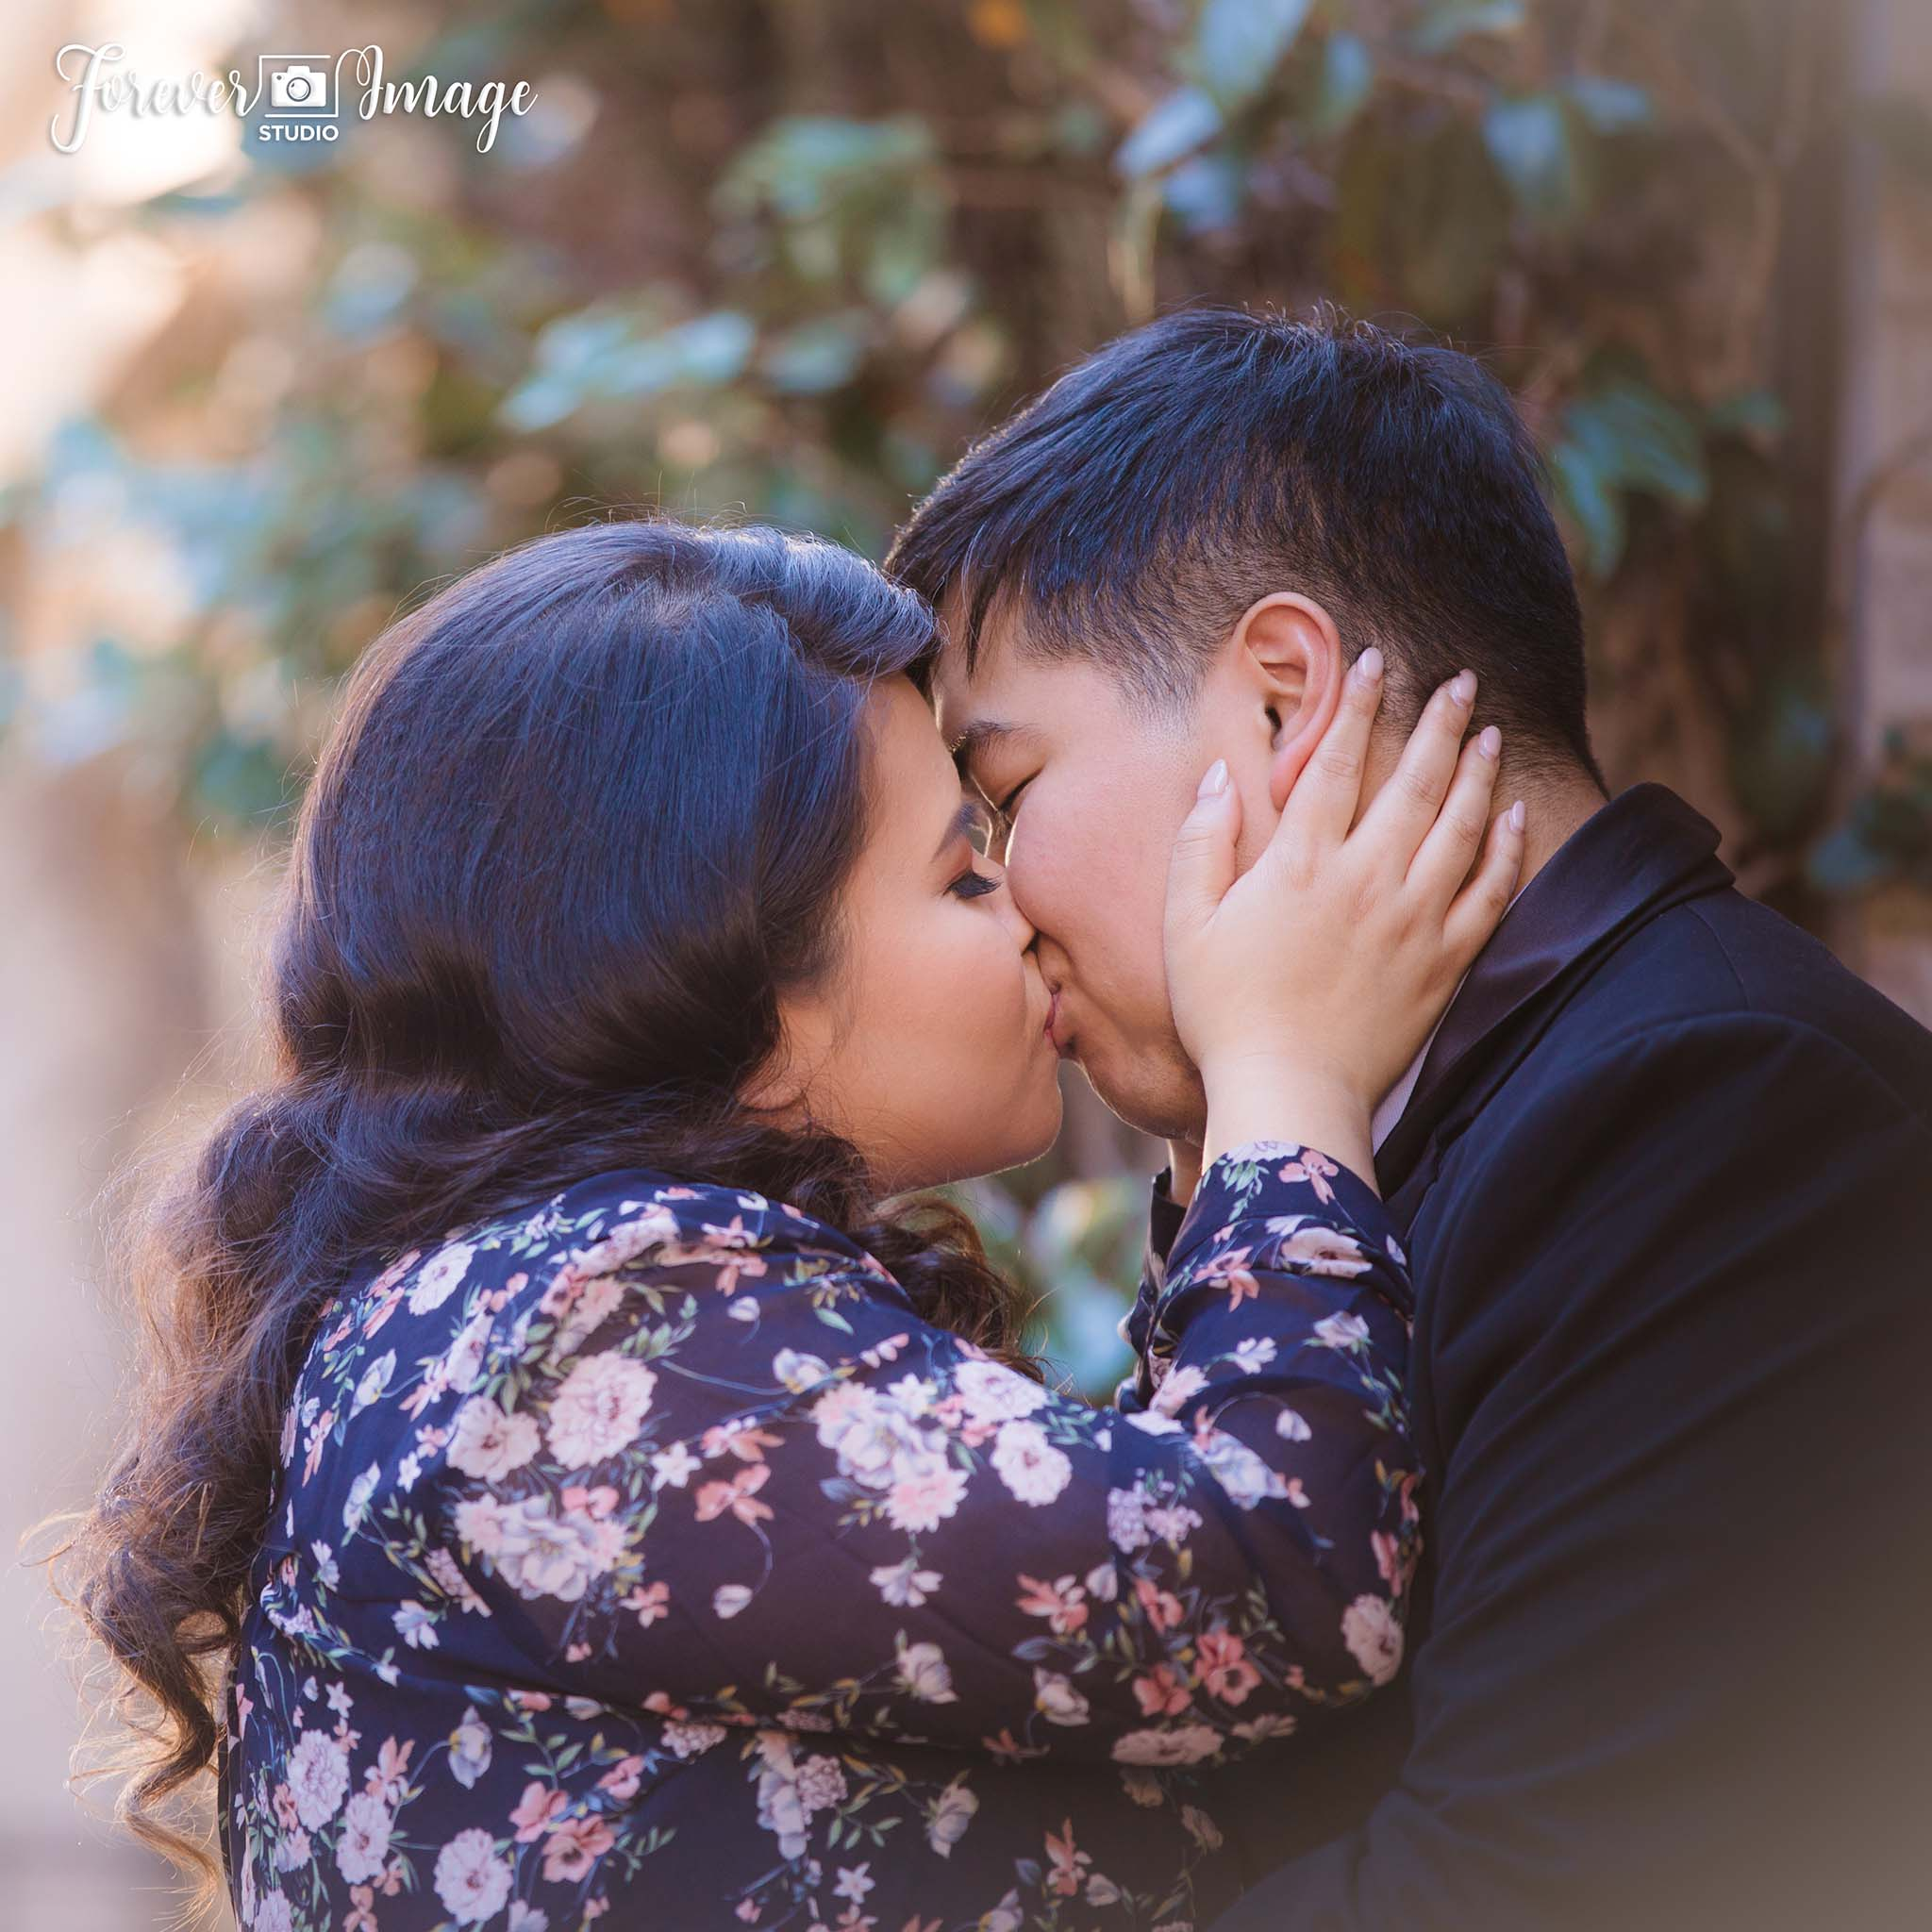 THUY-CHI & ROBERT | Happy In Love | Forever Image Studio